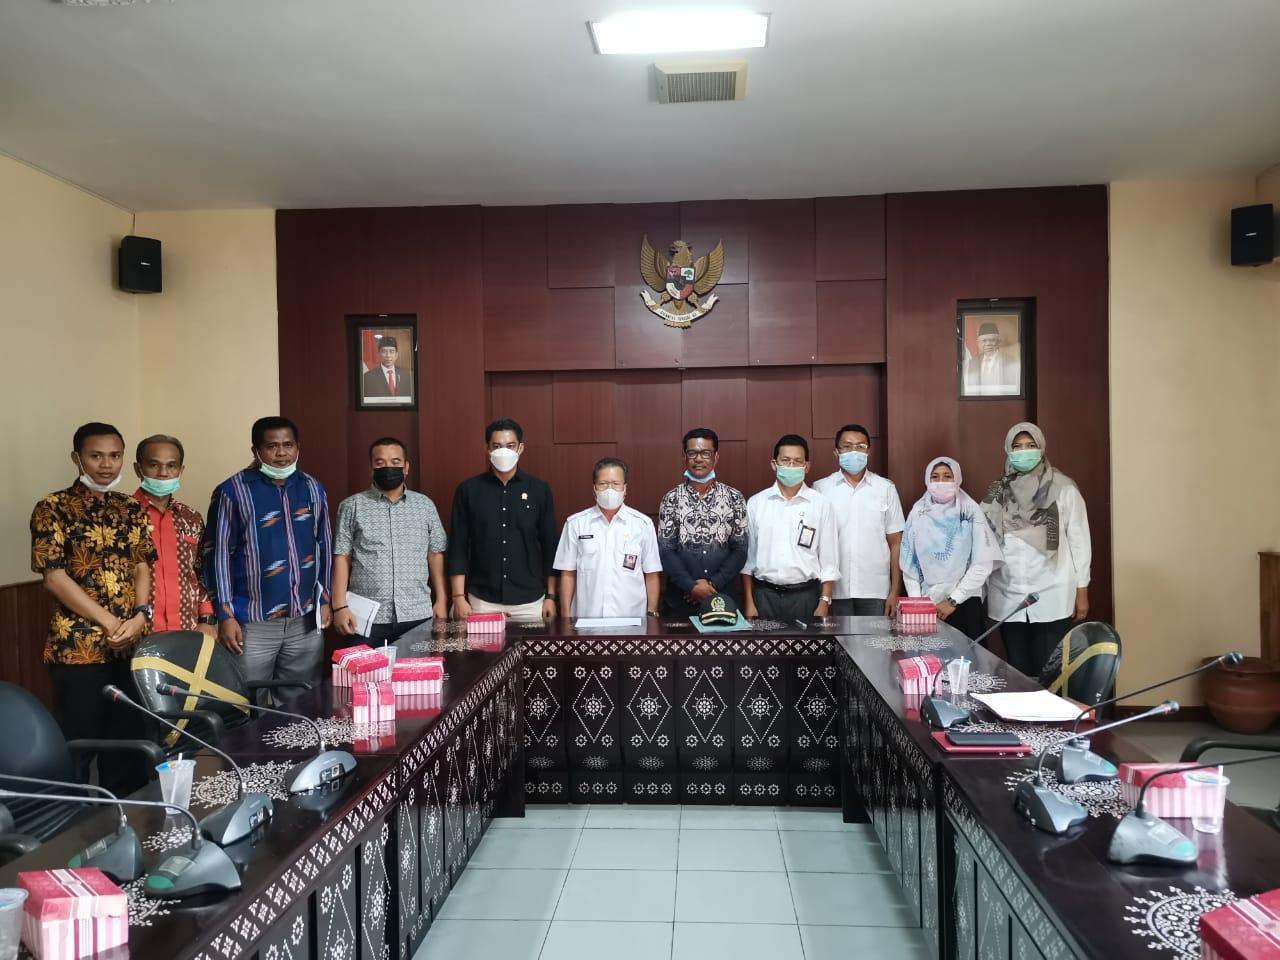 Konsultasi dan Koordinasi DPRD Kabupaten Bima ke Dinas PUPR Provinsi NTB terkait Infrastruktur